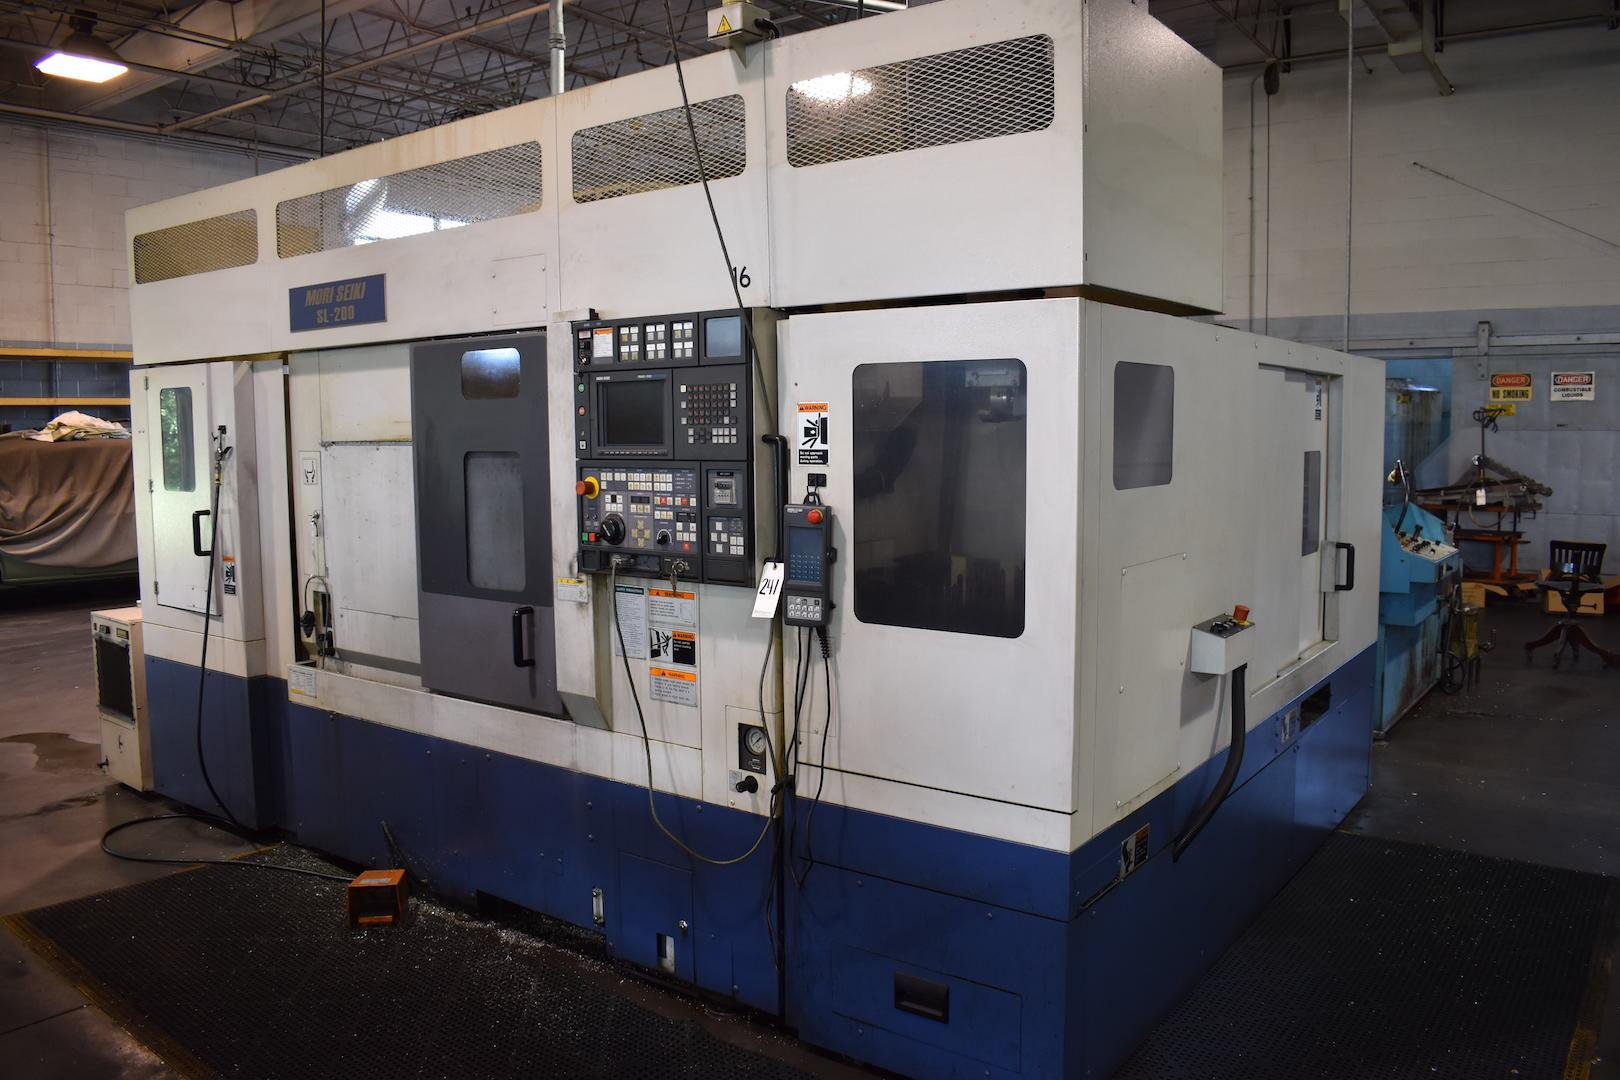 Lot 241 - Mori Seiki Model SL-200MC CNC Turning Center, S/N 1055 (1999), Mori Seiki Model MSC-501 CNC Control,